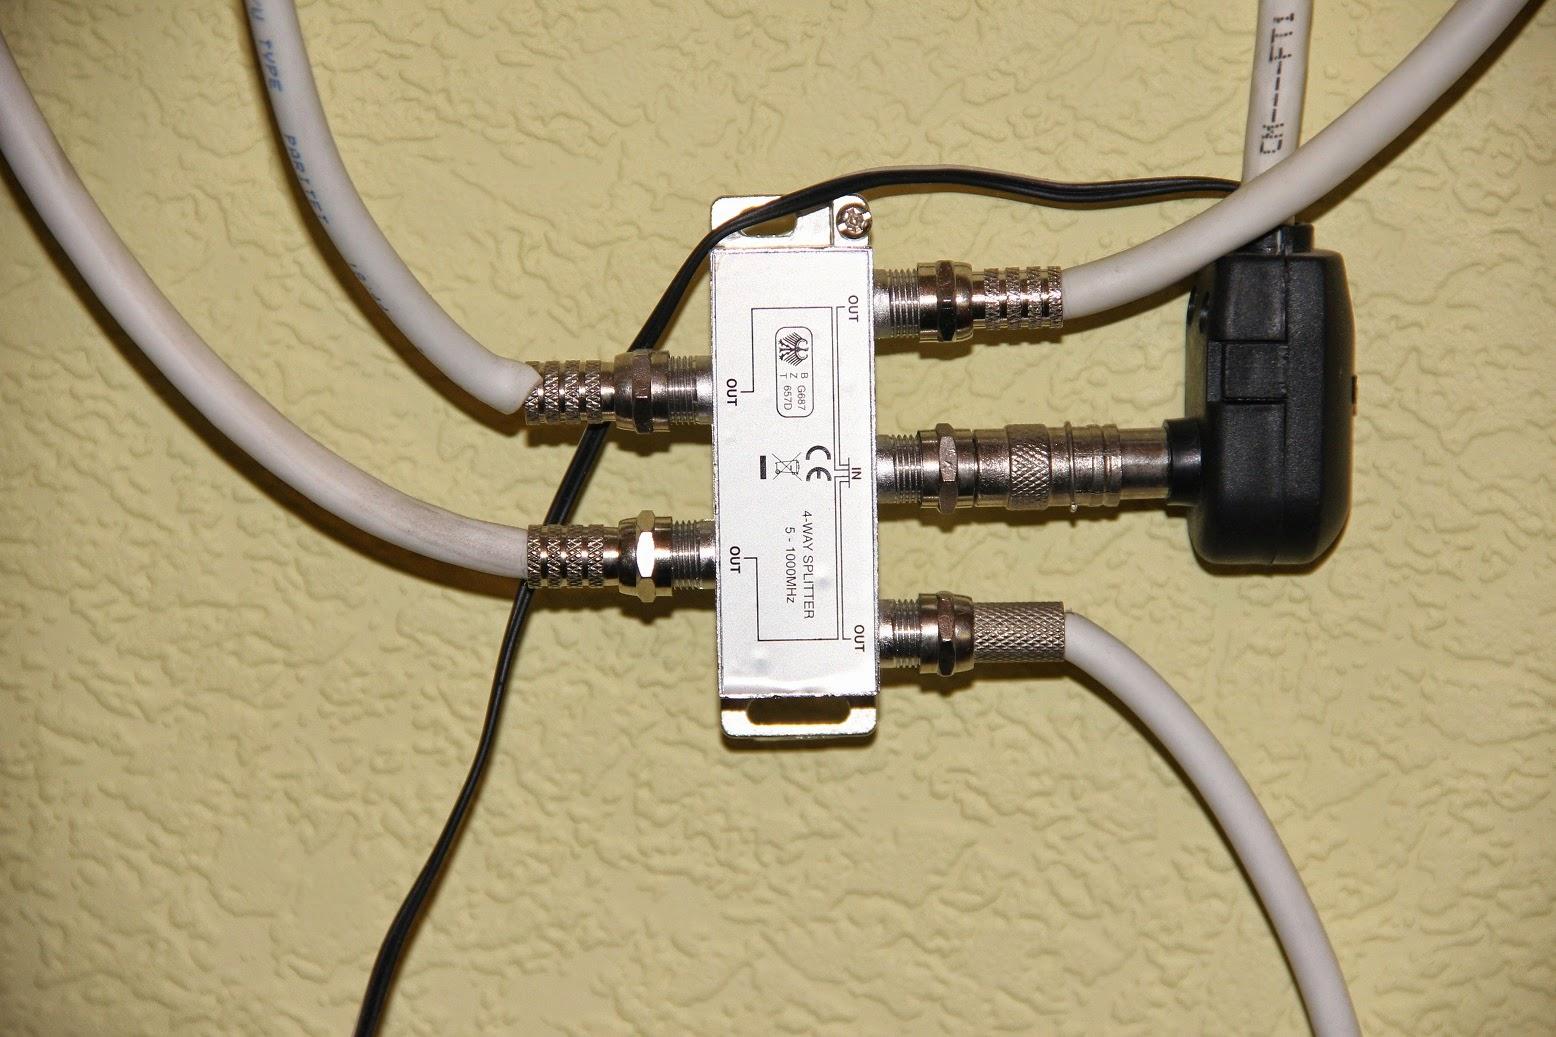 схема усилители дмв телевизионного сигнала